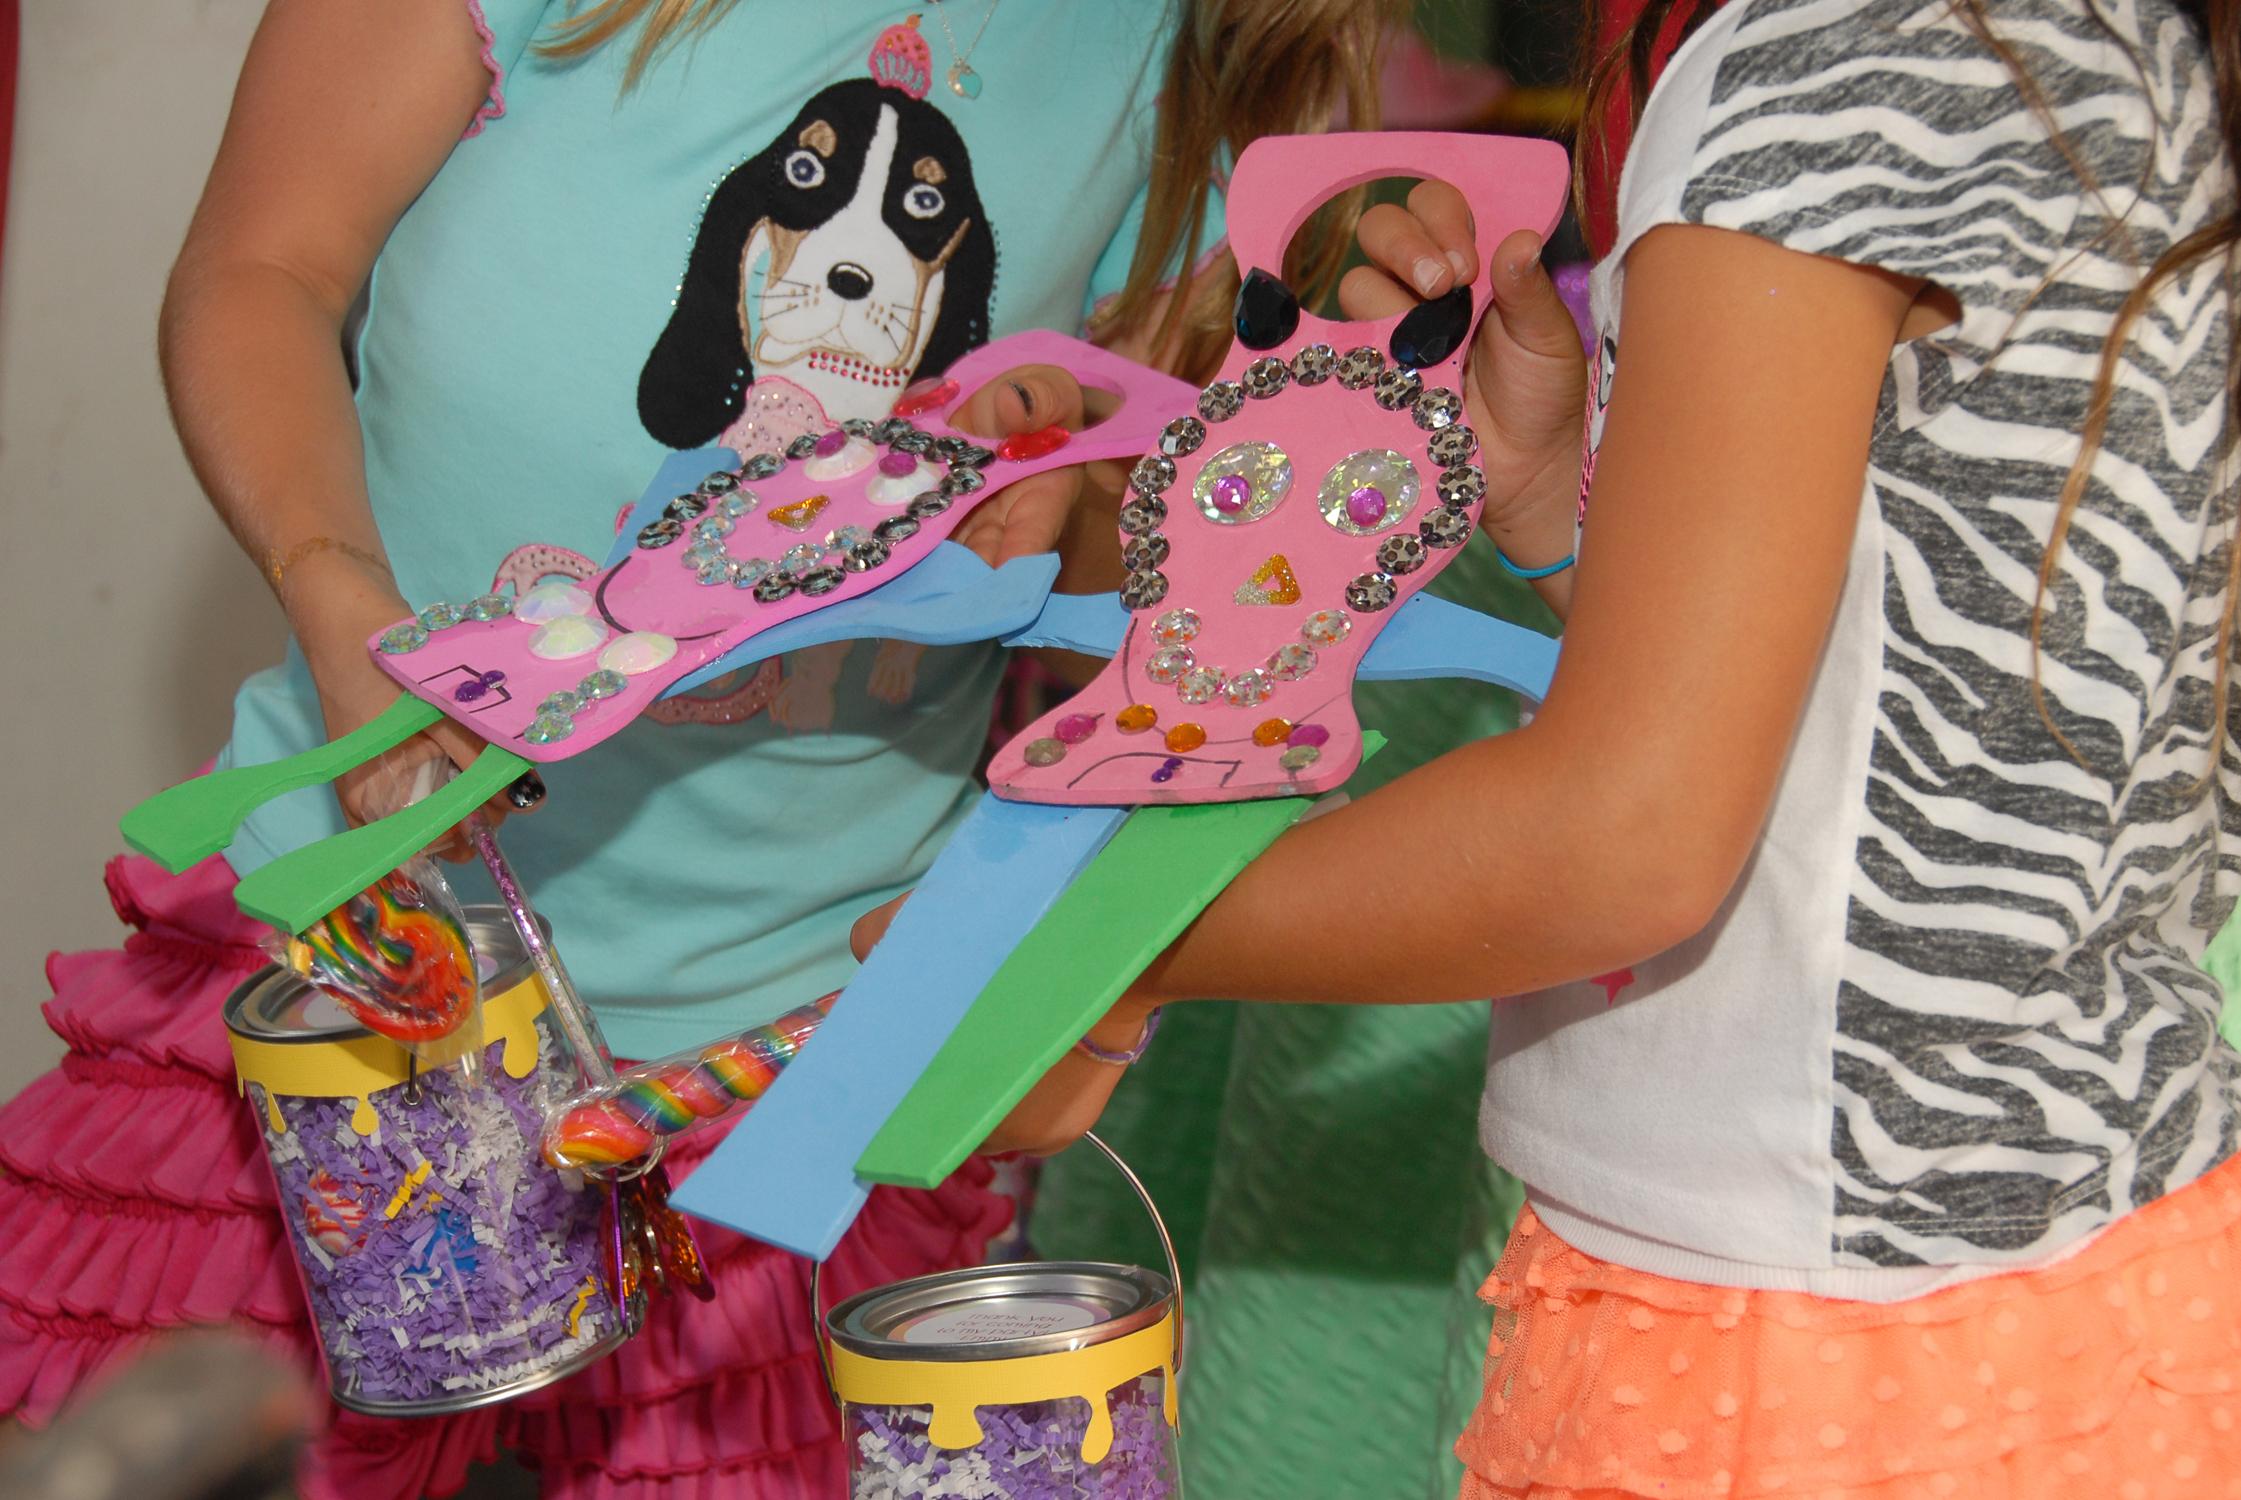 tarynco-events-kids-party-art-carnival-themed-artandcrafts.jpg